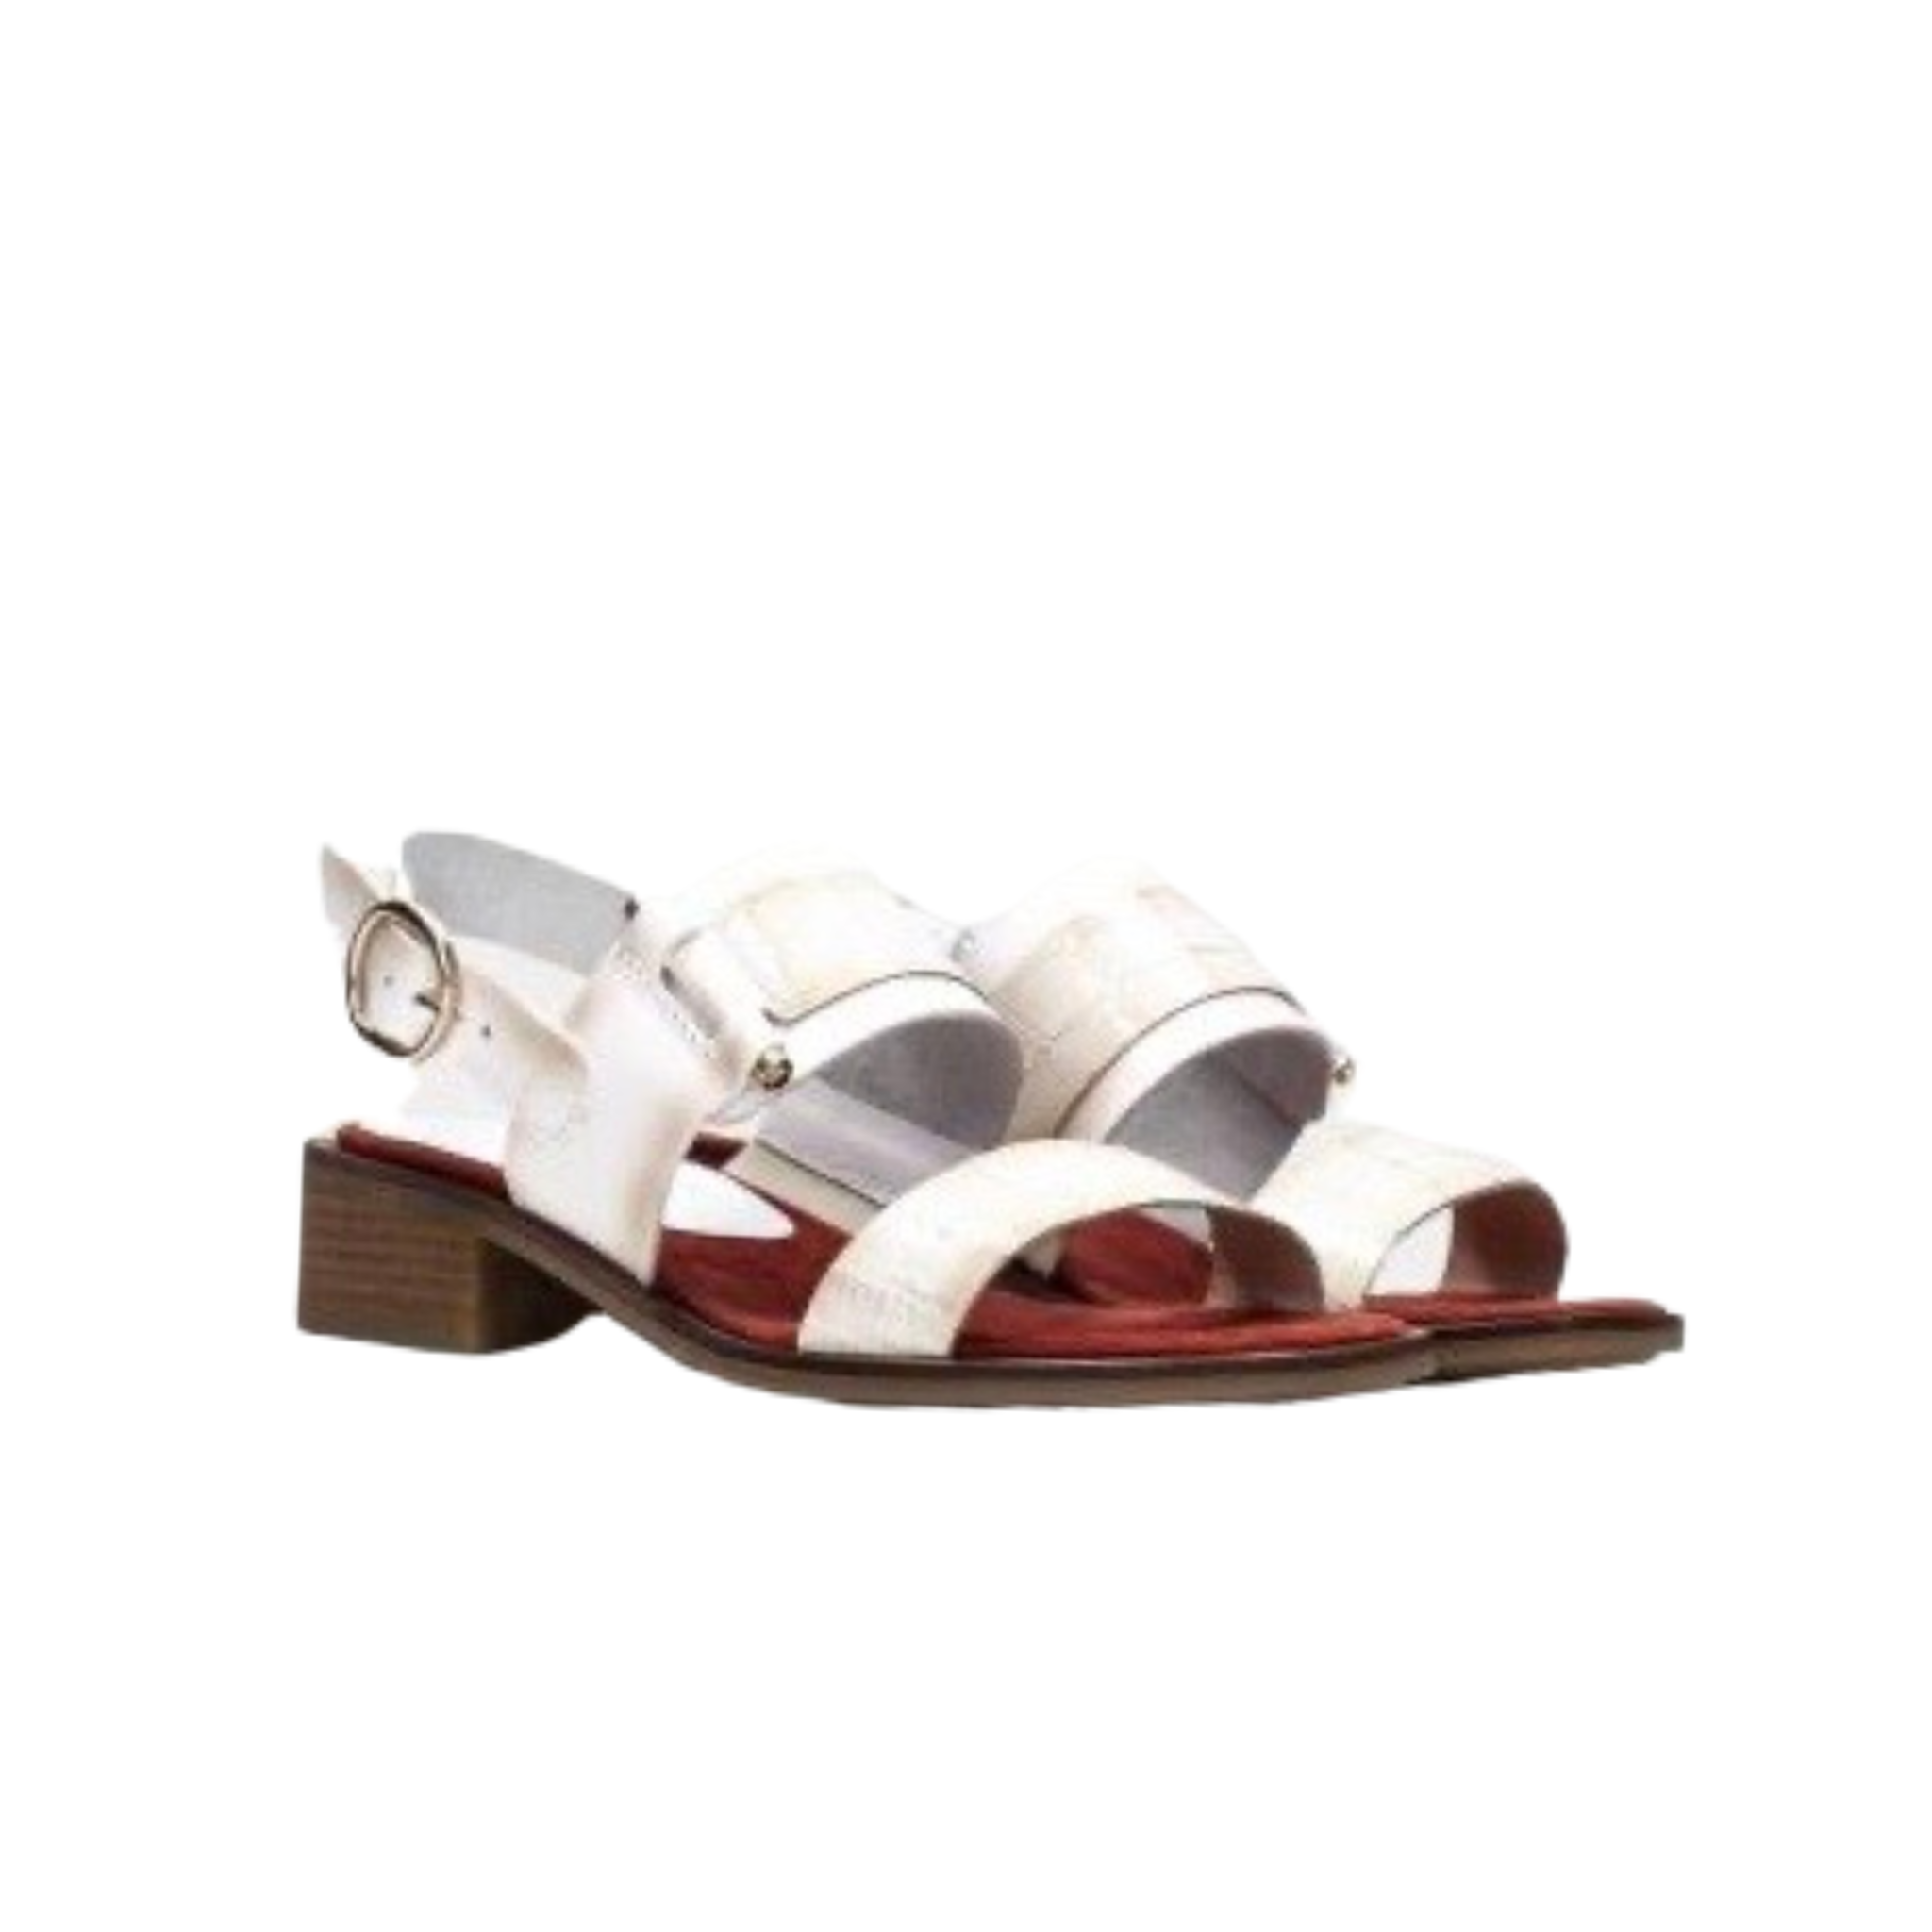 Hispanitas Atenas sandal